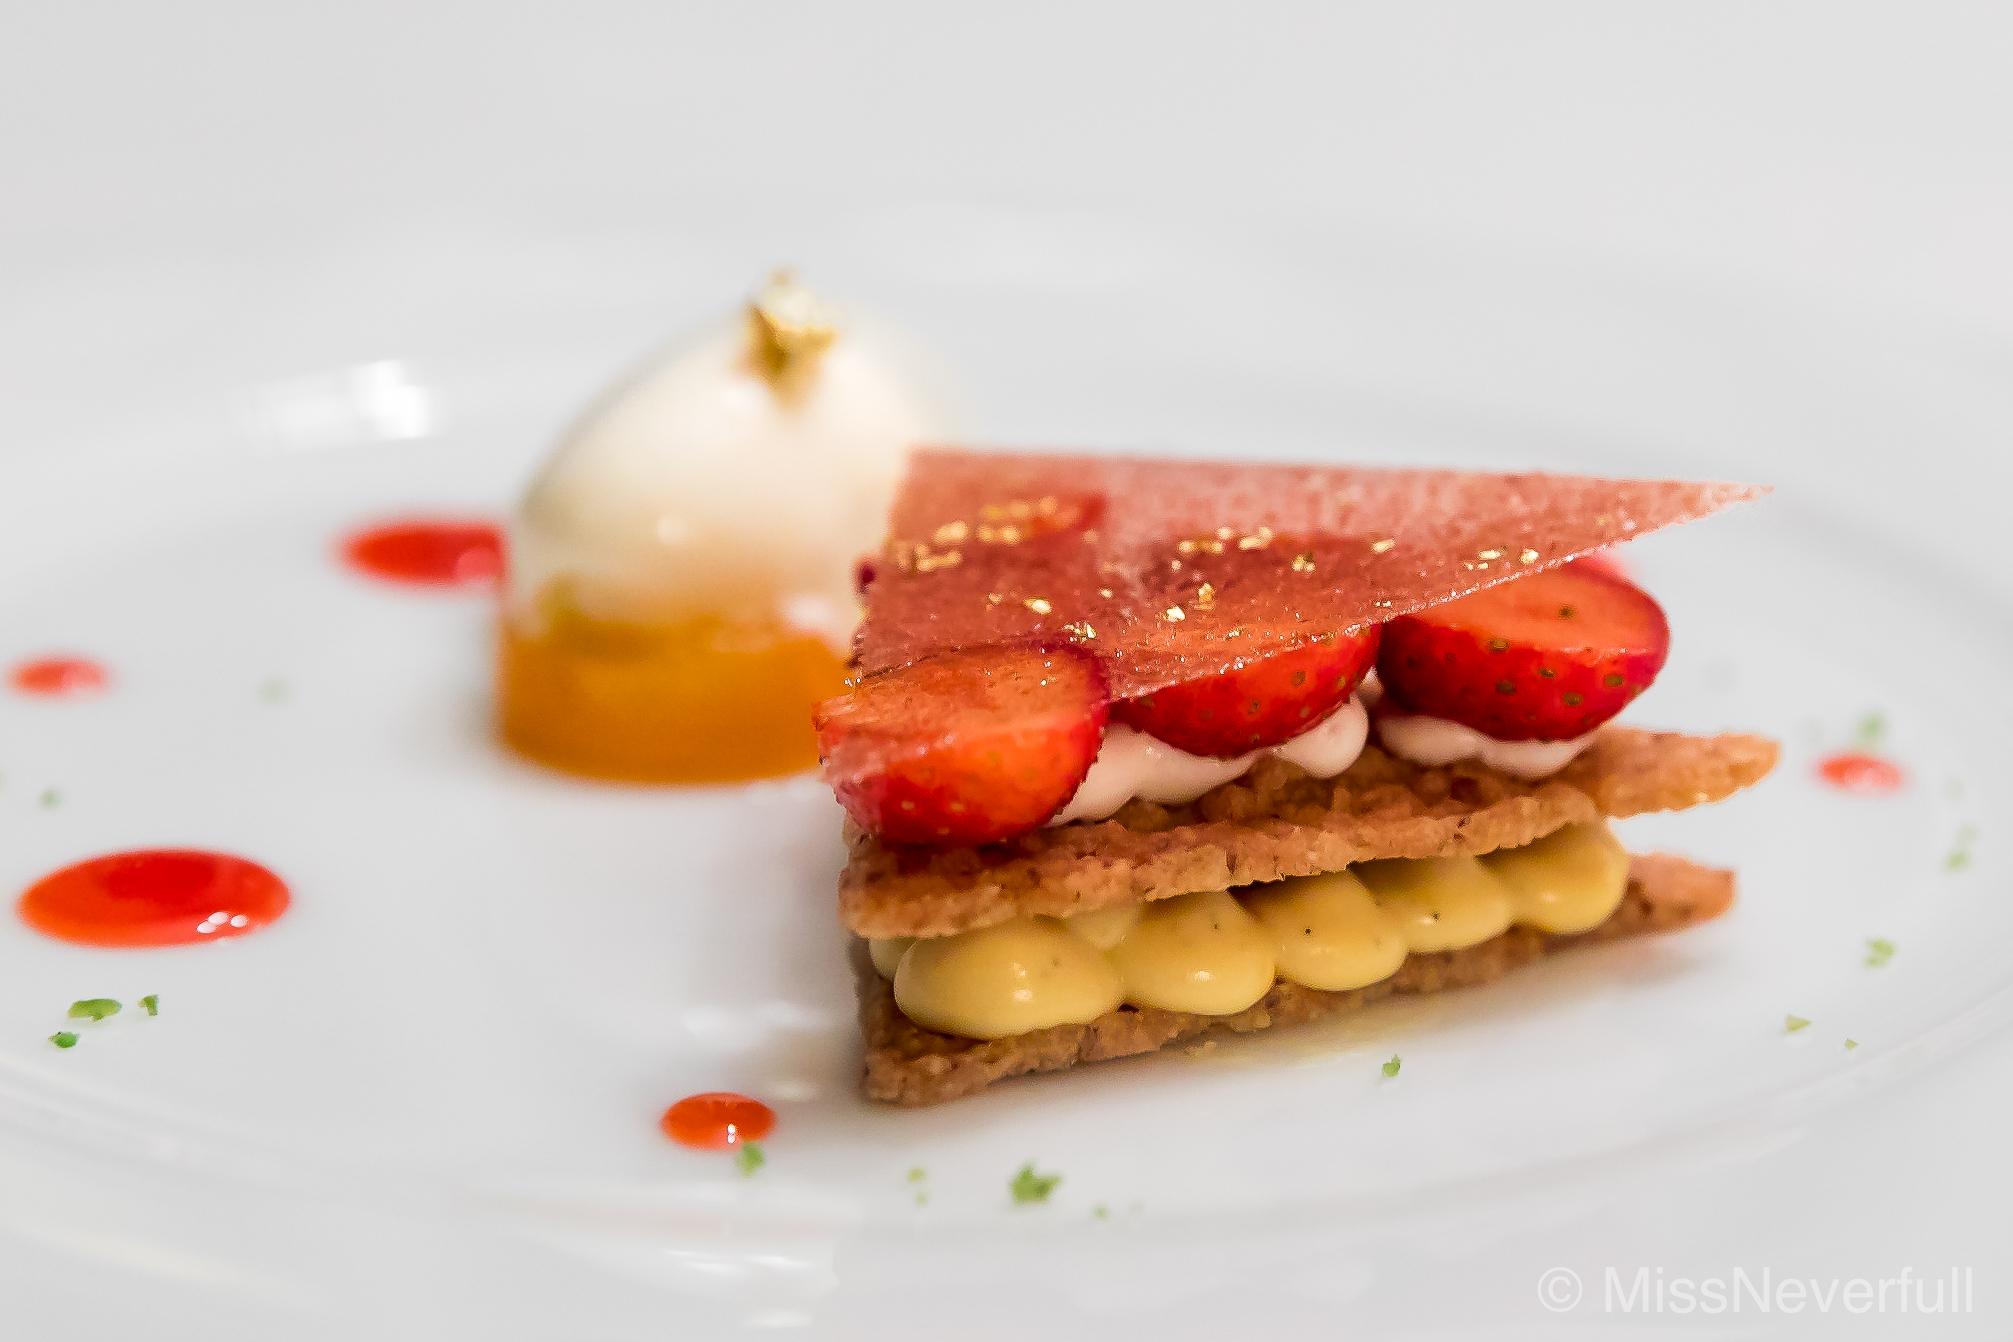 6. Dessert: Marinated strawberry and meringue with yogurt orange sorbet